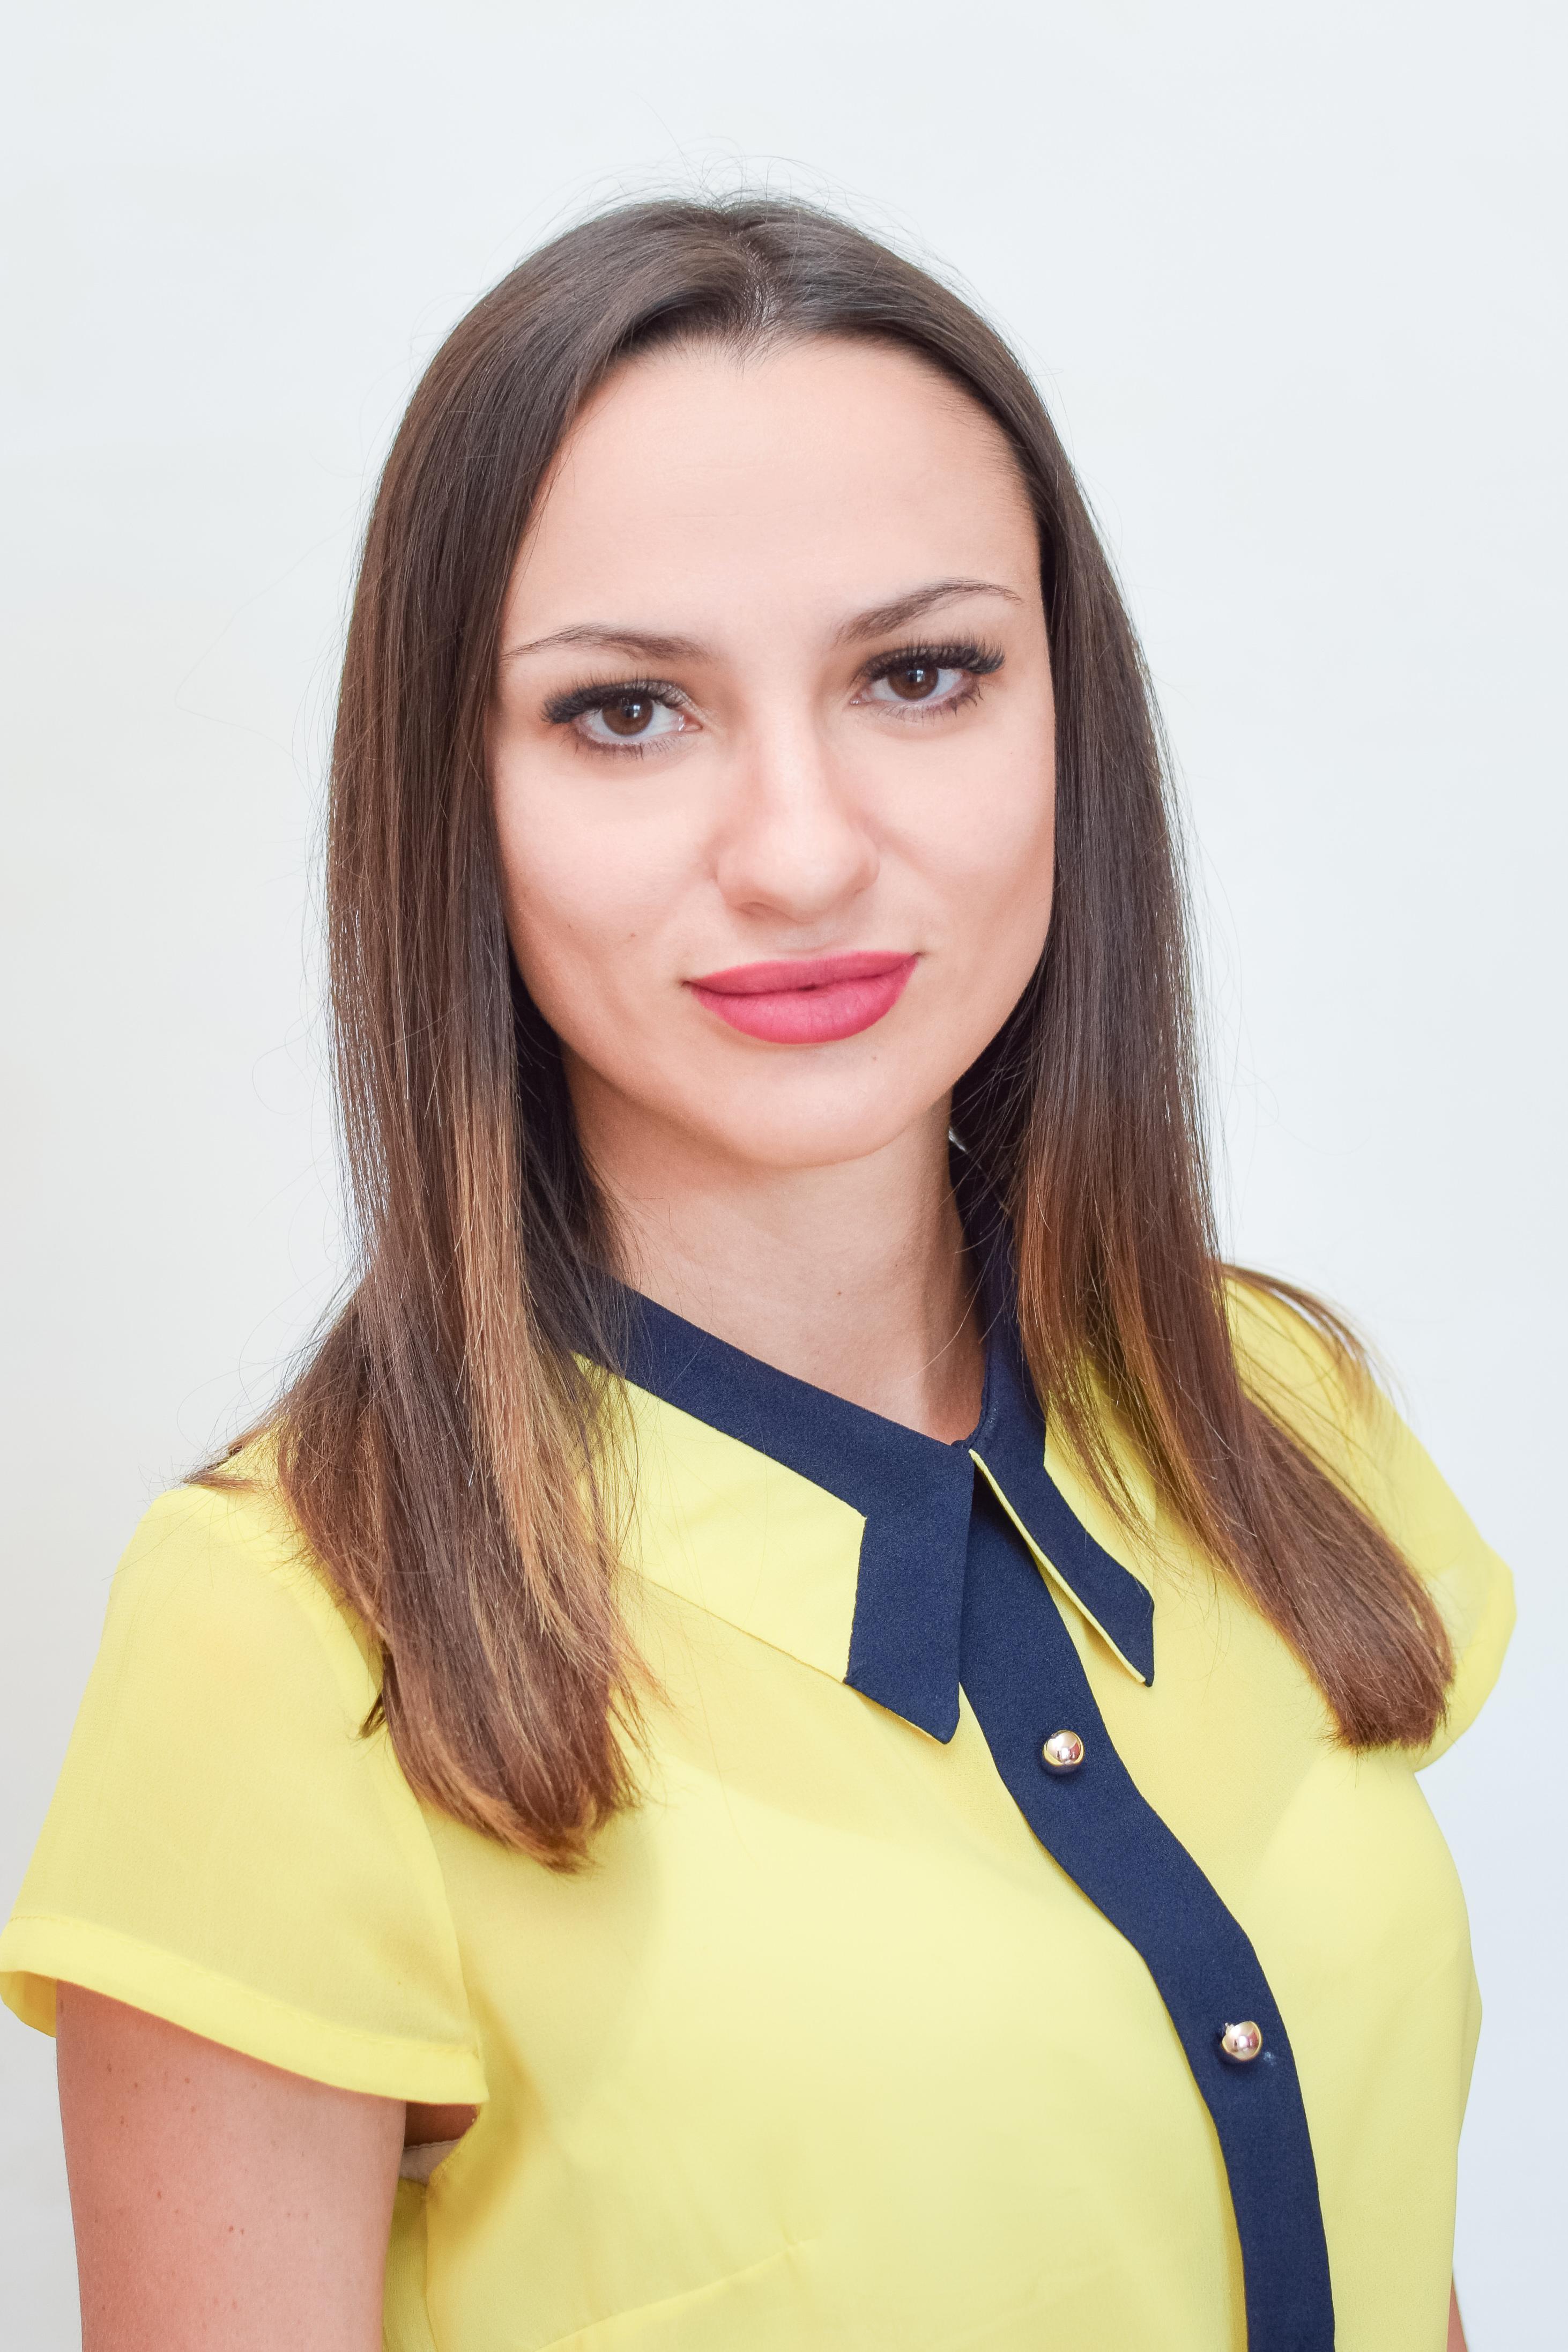 Нестеренко Олена  Миколаївна